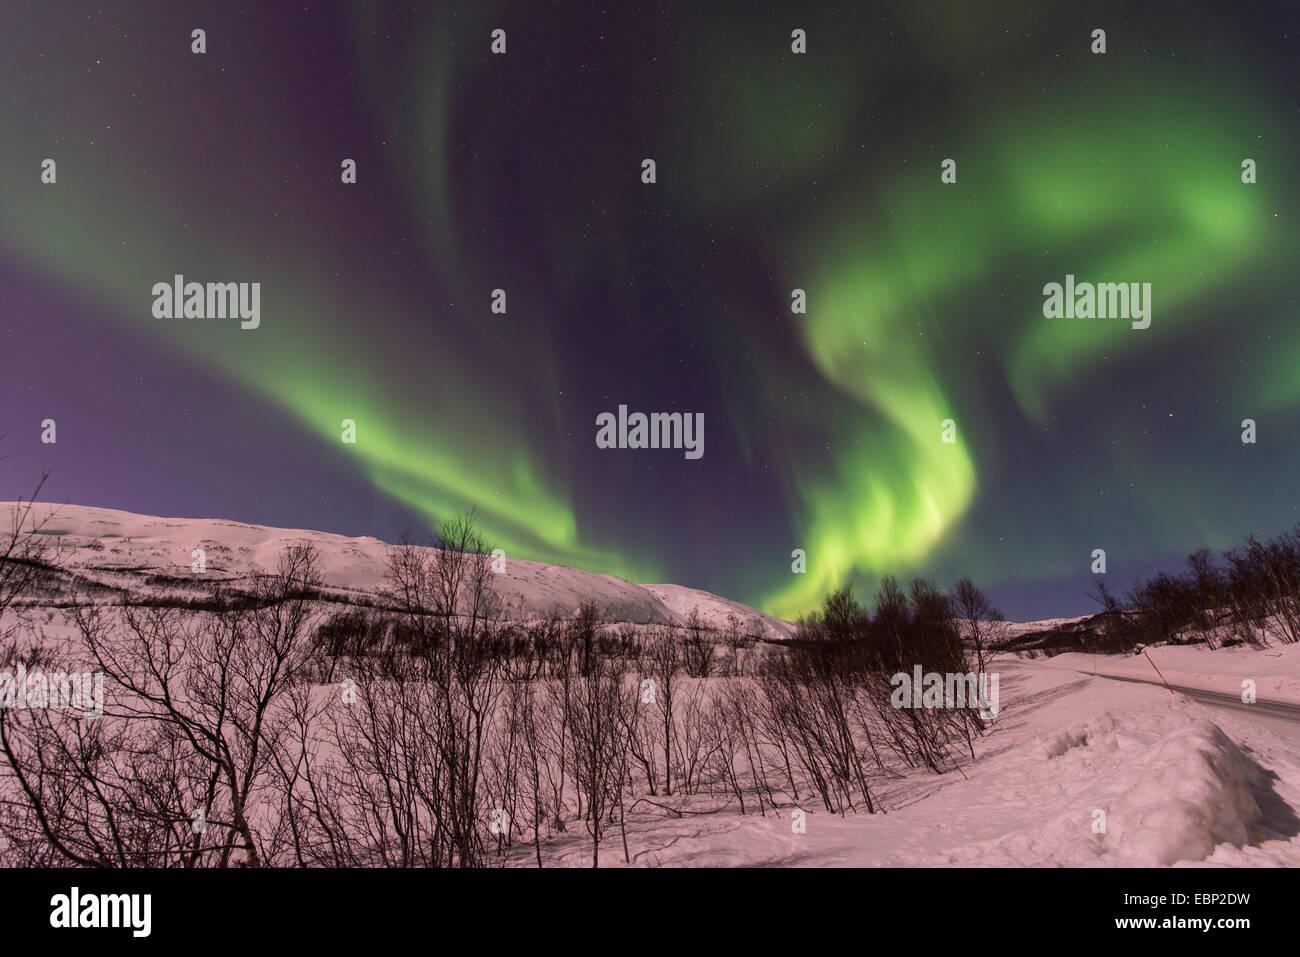 Eddy aurora en paysage d'hiver, la Norvège, Troms, Finnvikdalen Photo Stock